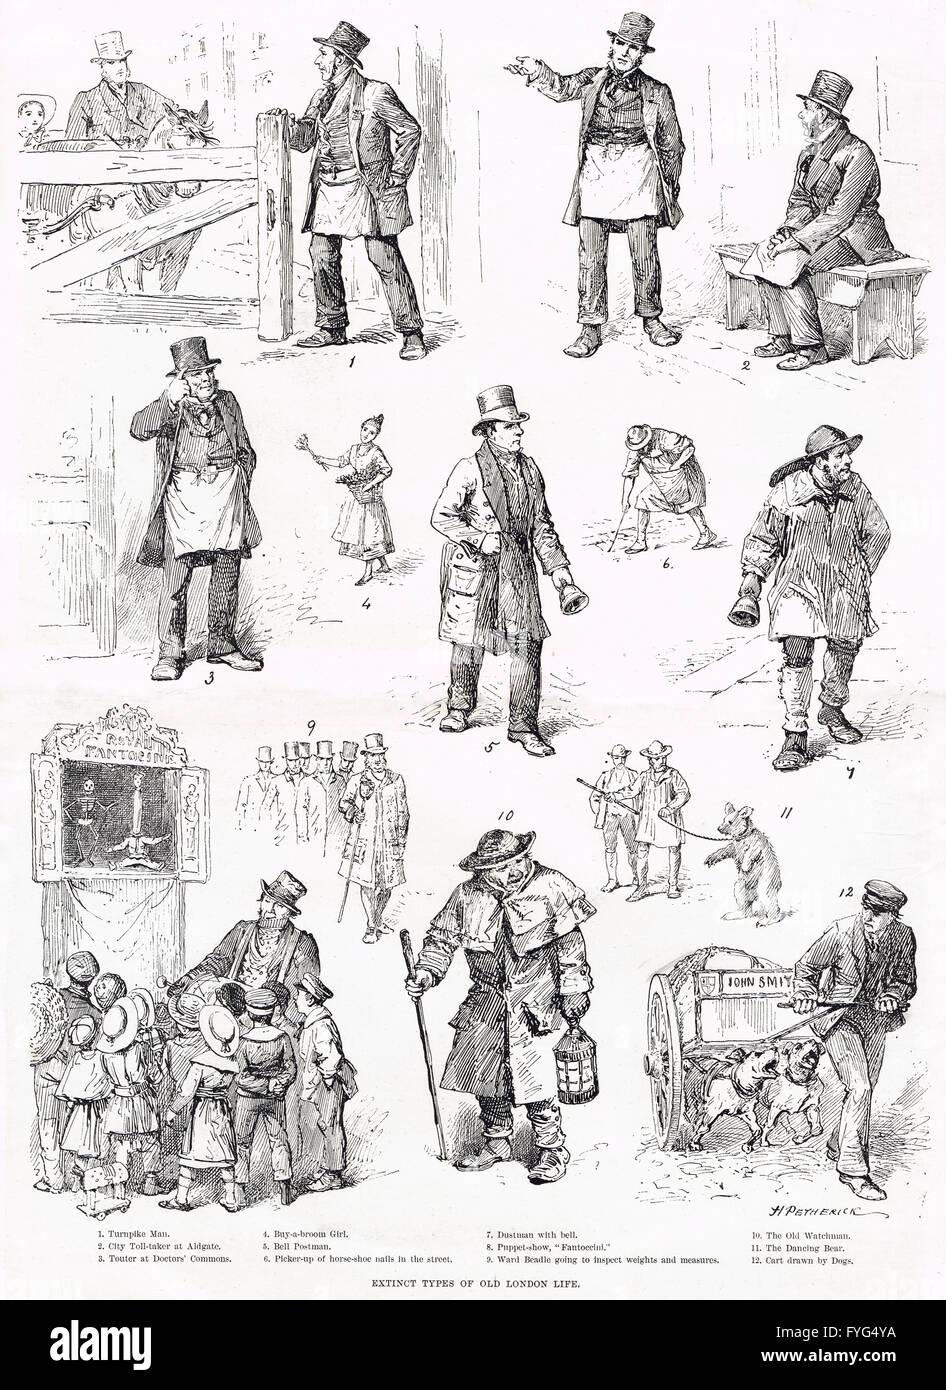 Extinct types of Old London Life 1890 - Stock Image